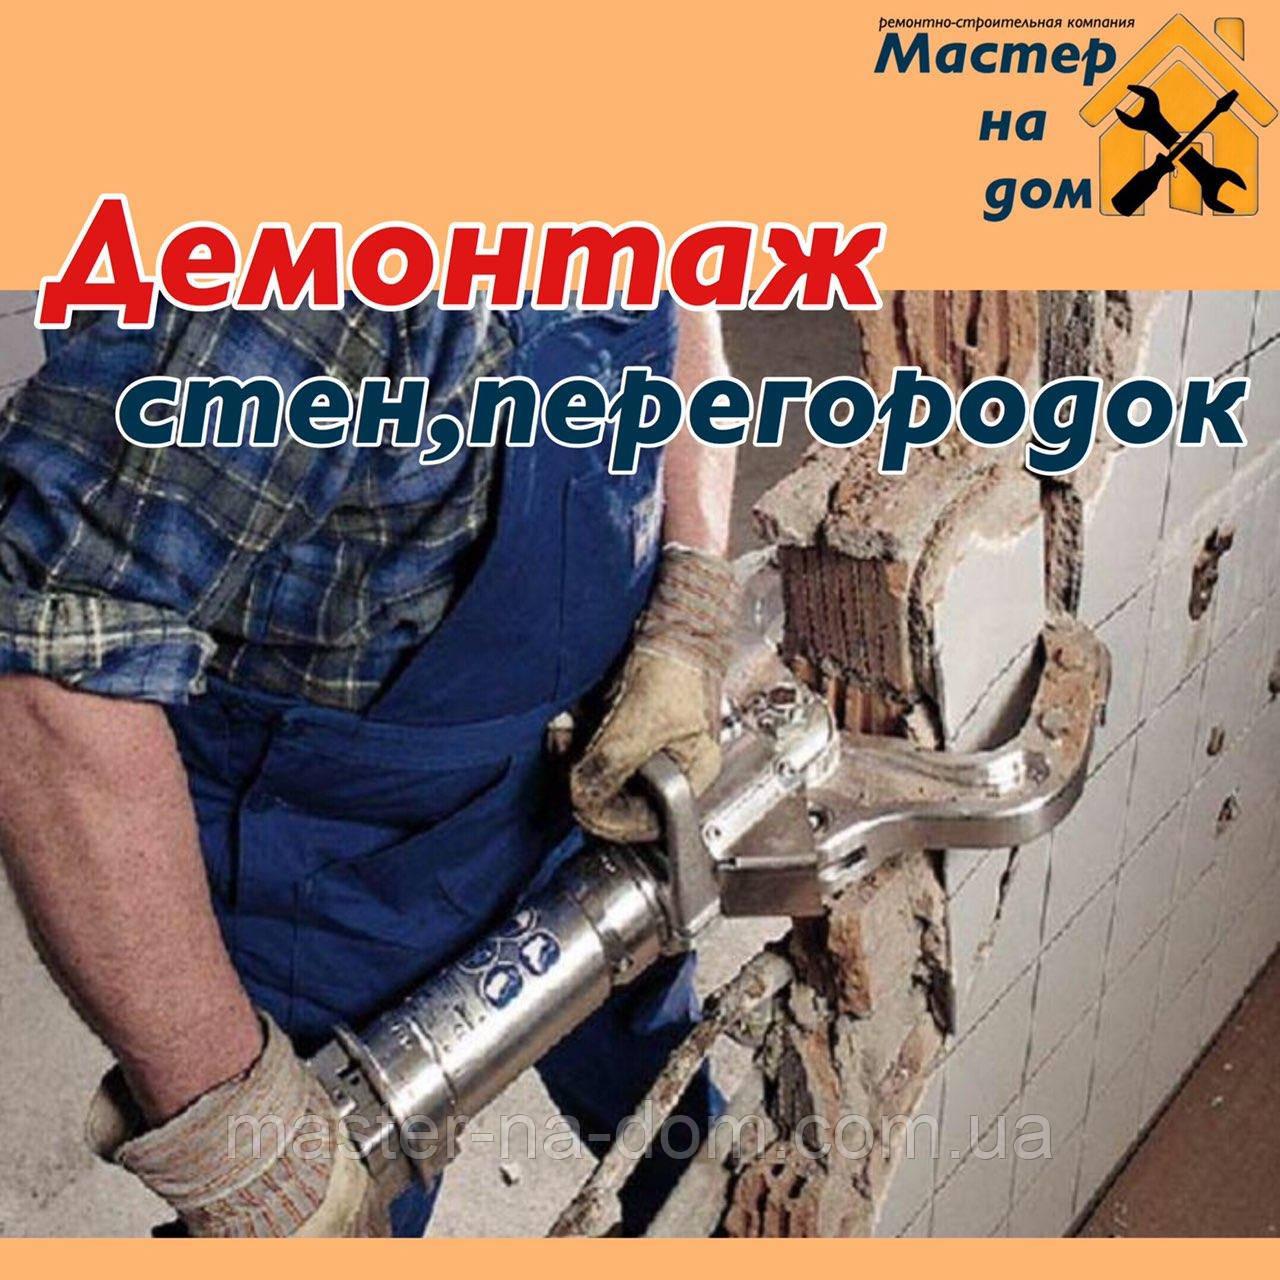 Демонтаж стен, перегородок во Львове